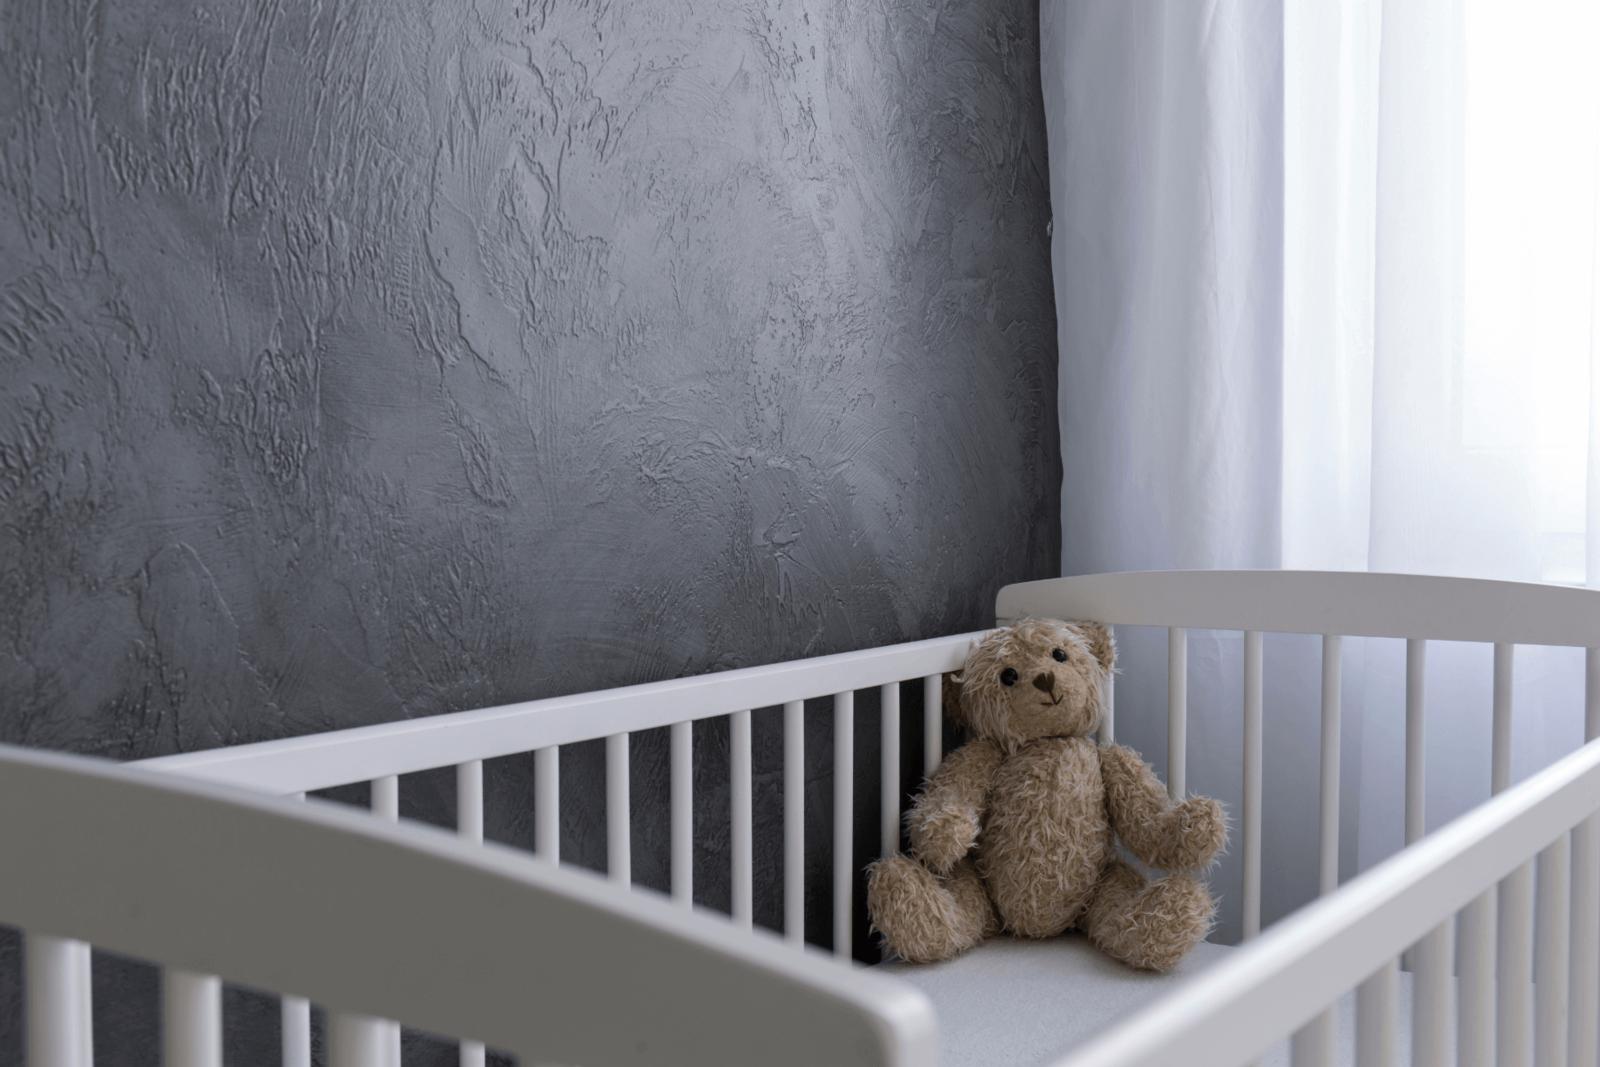 defective crib